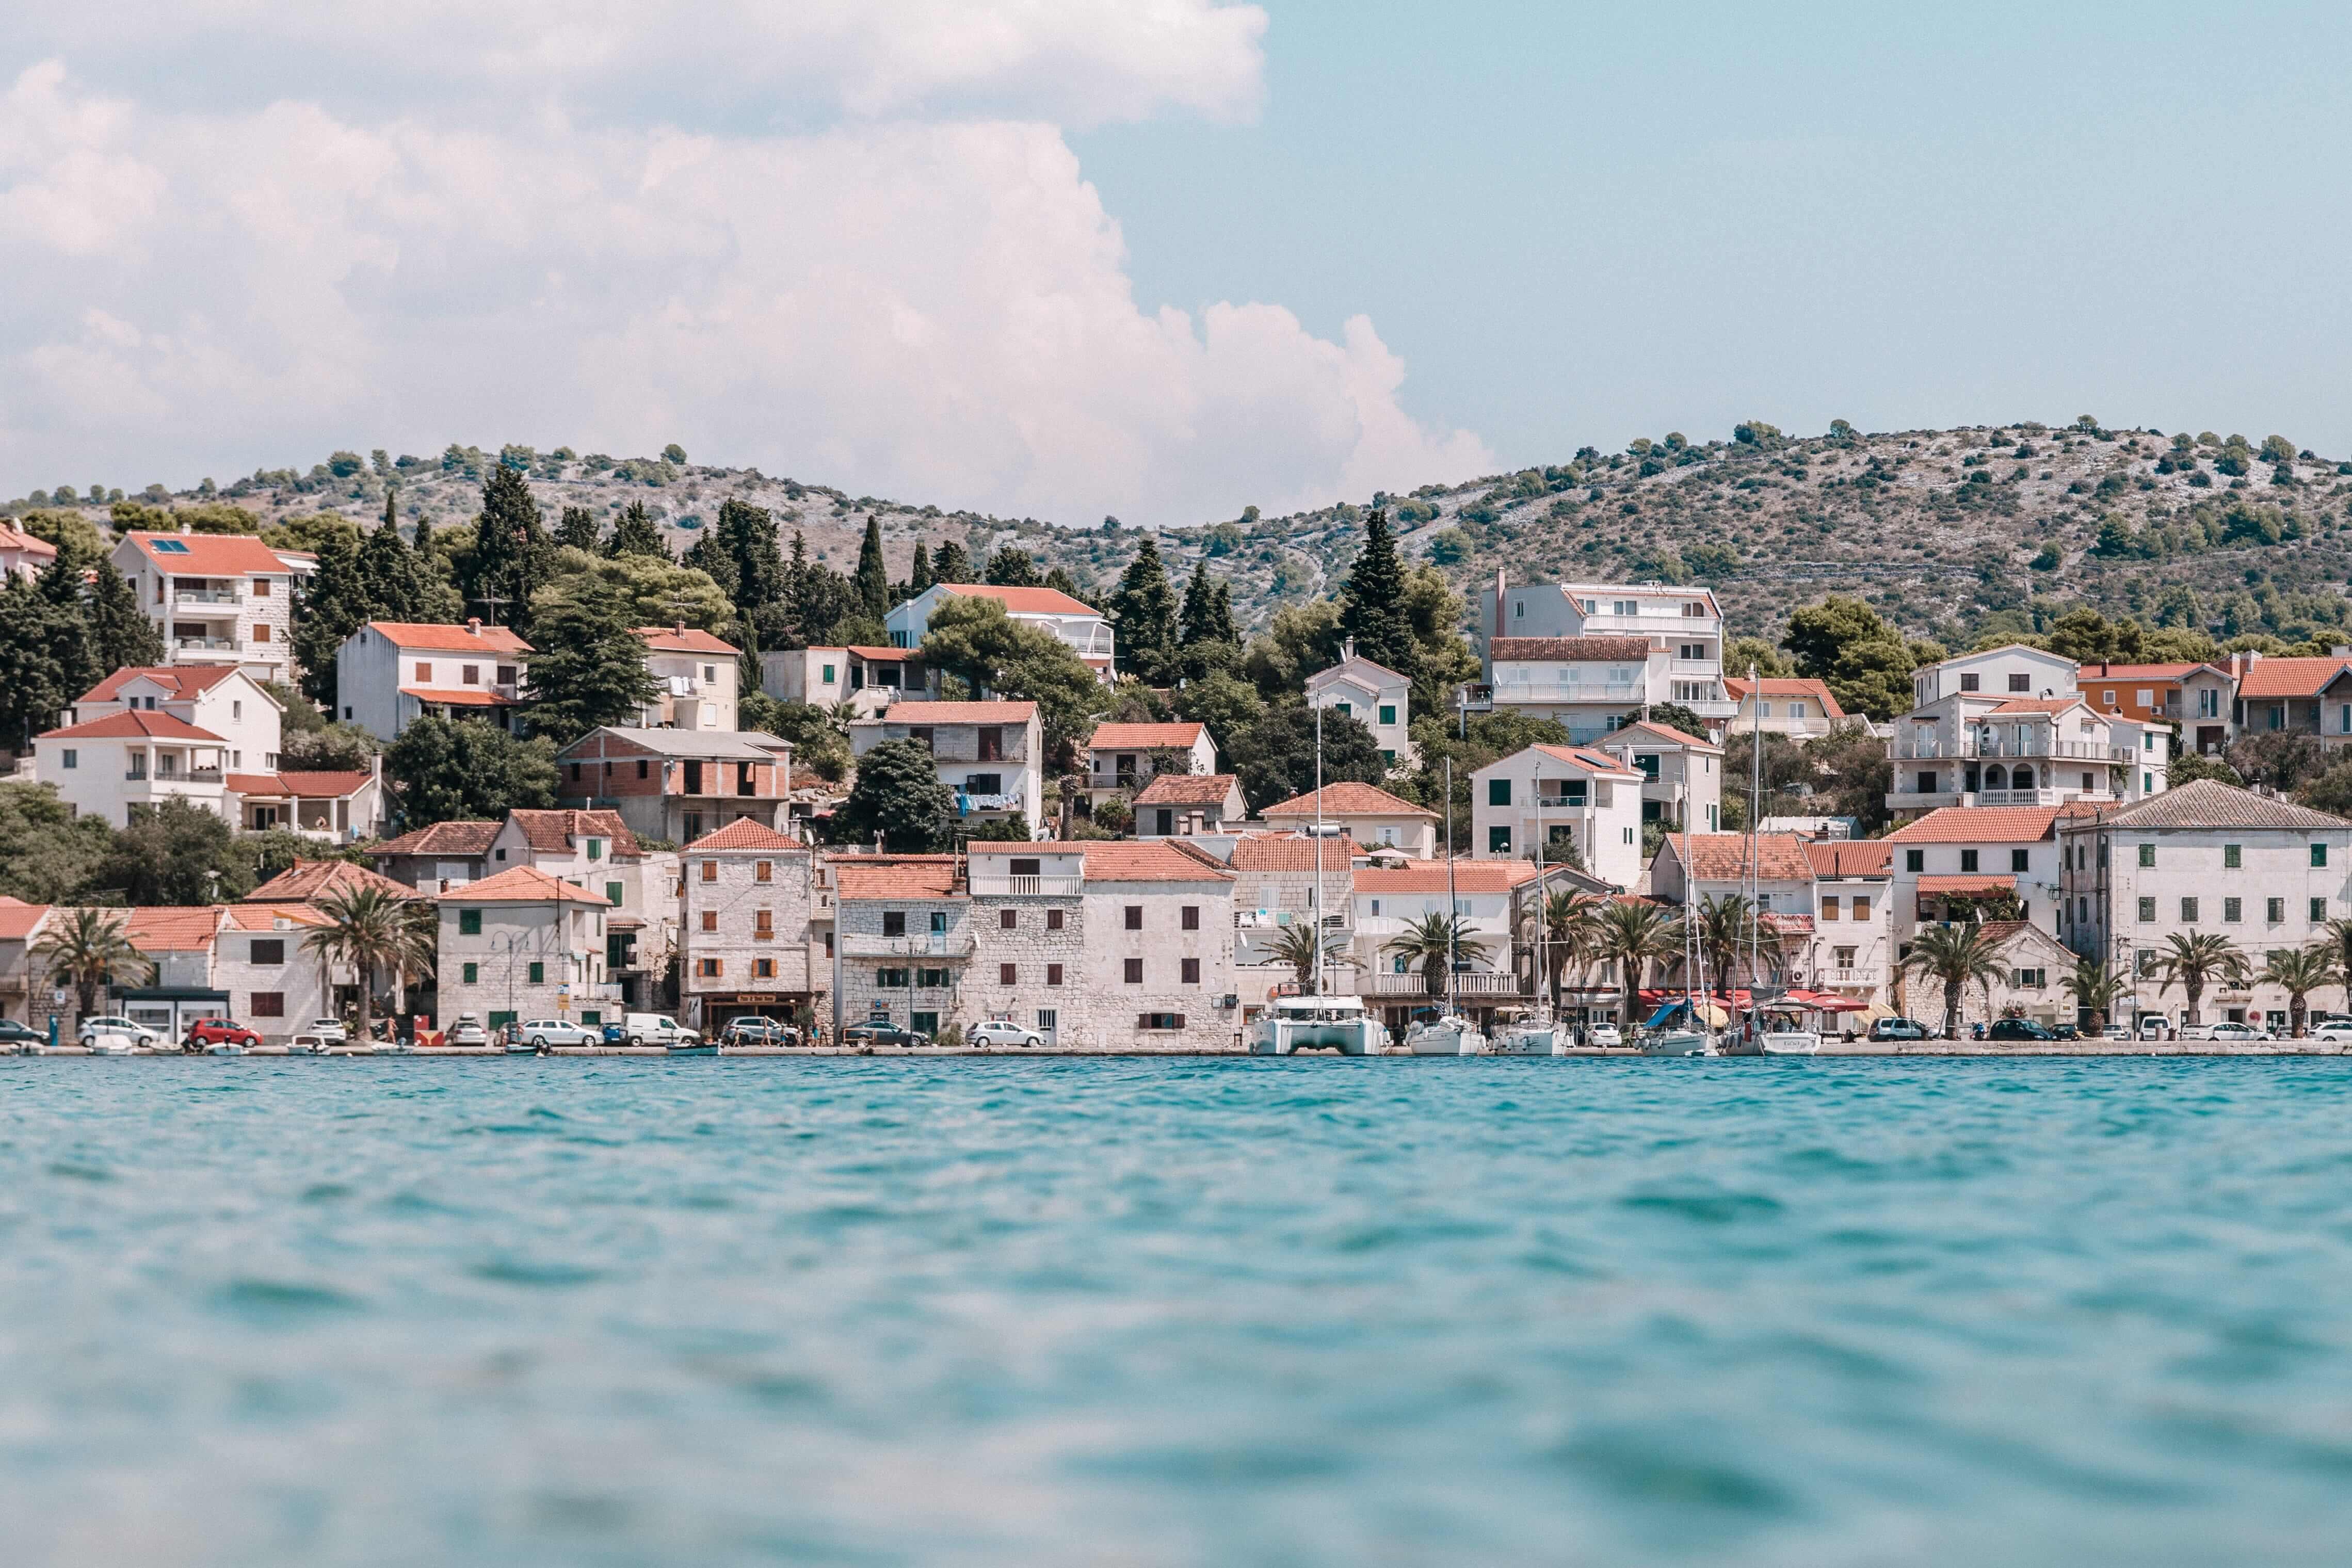 Urlaub mit dem Boot